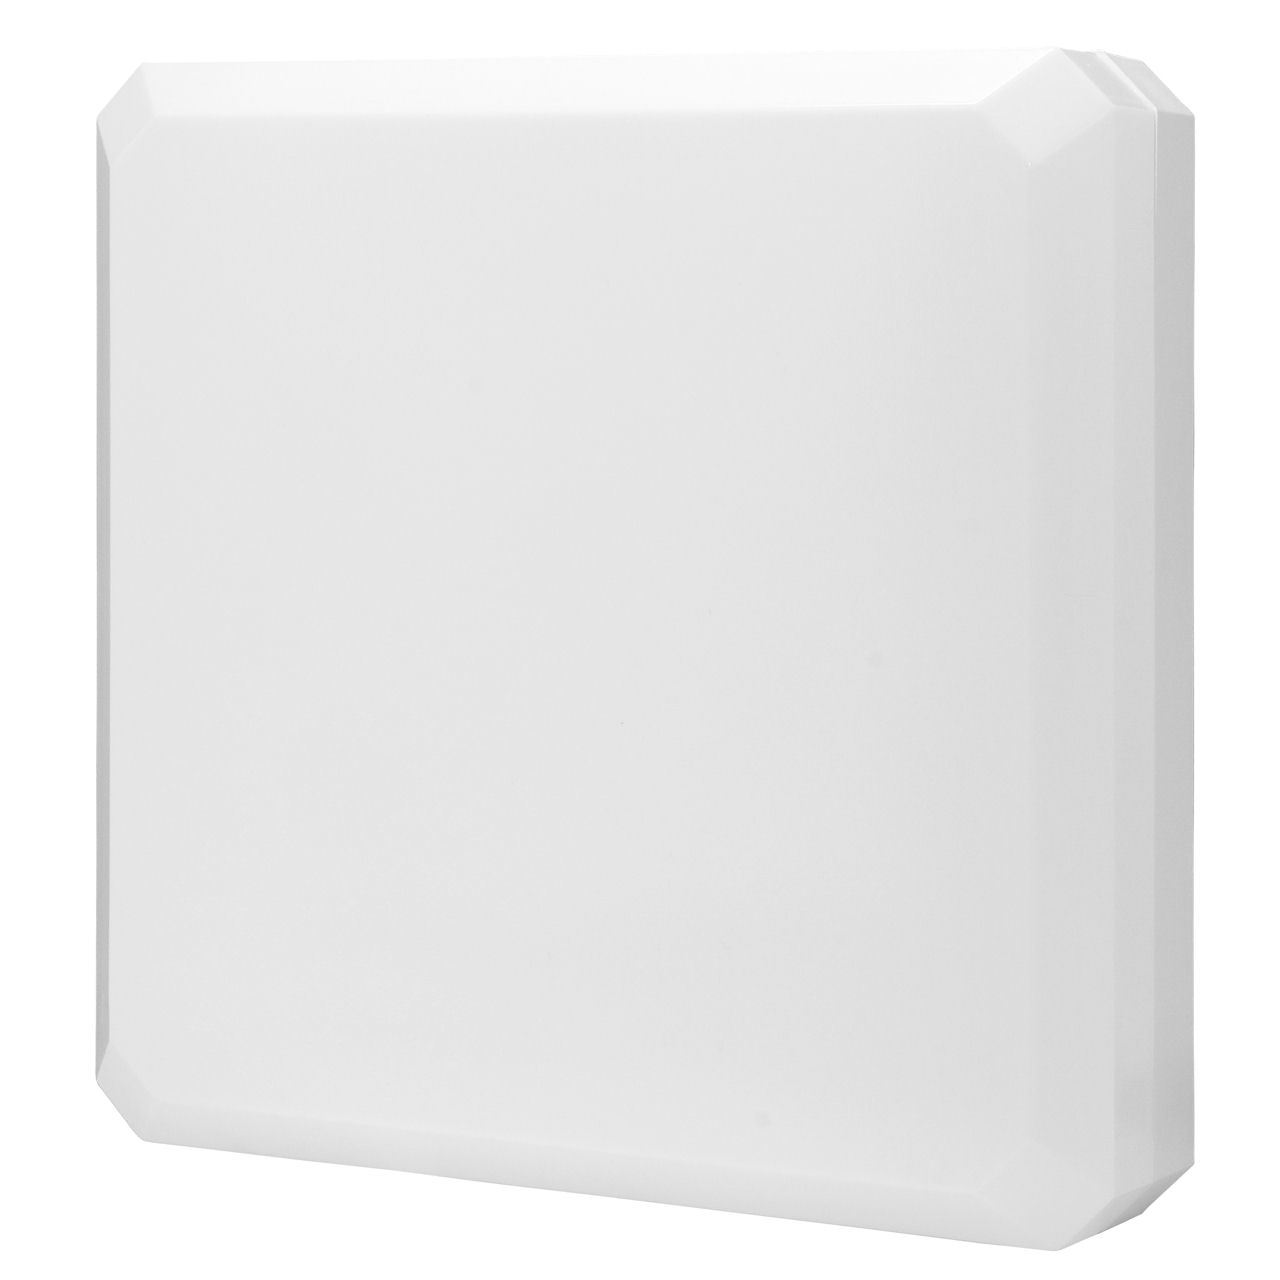 Люминесцентный аварийный светильник 2х18/2х11W IP54 Square Awex